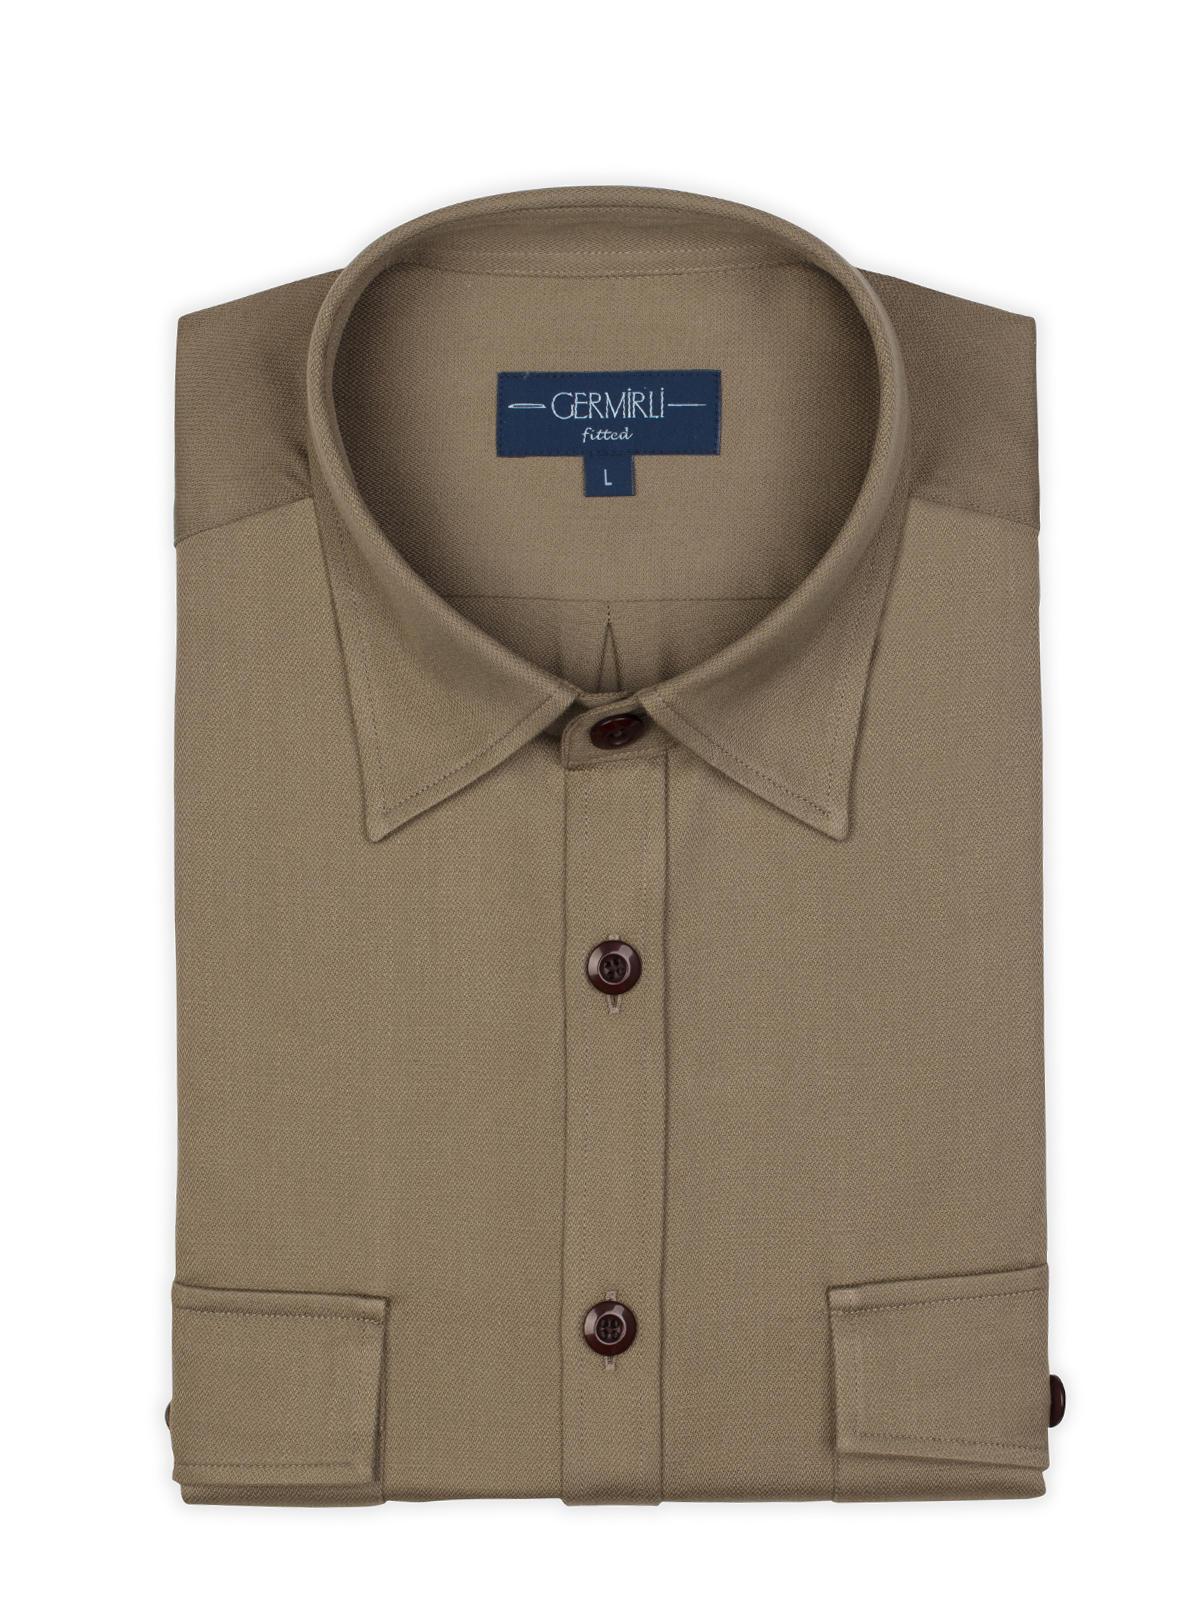 Germirli Haki Klasik Yaka Flanel Tailor Fit Overshirt Gömlek